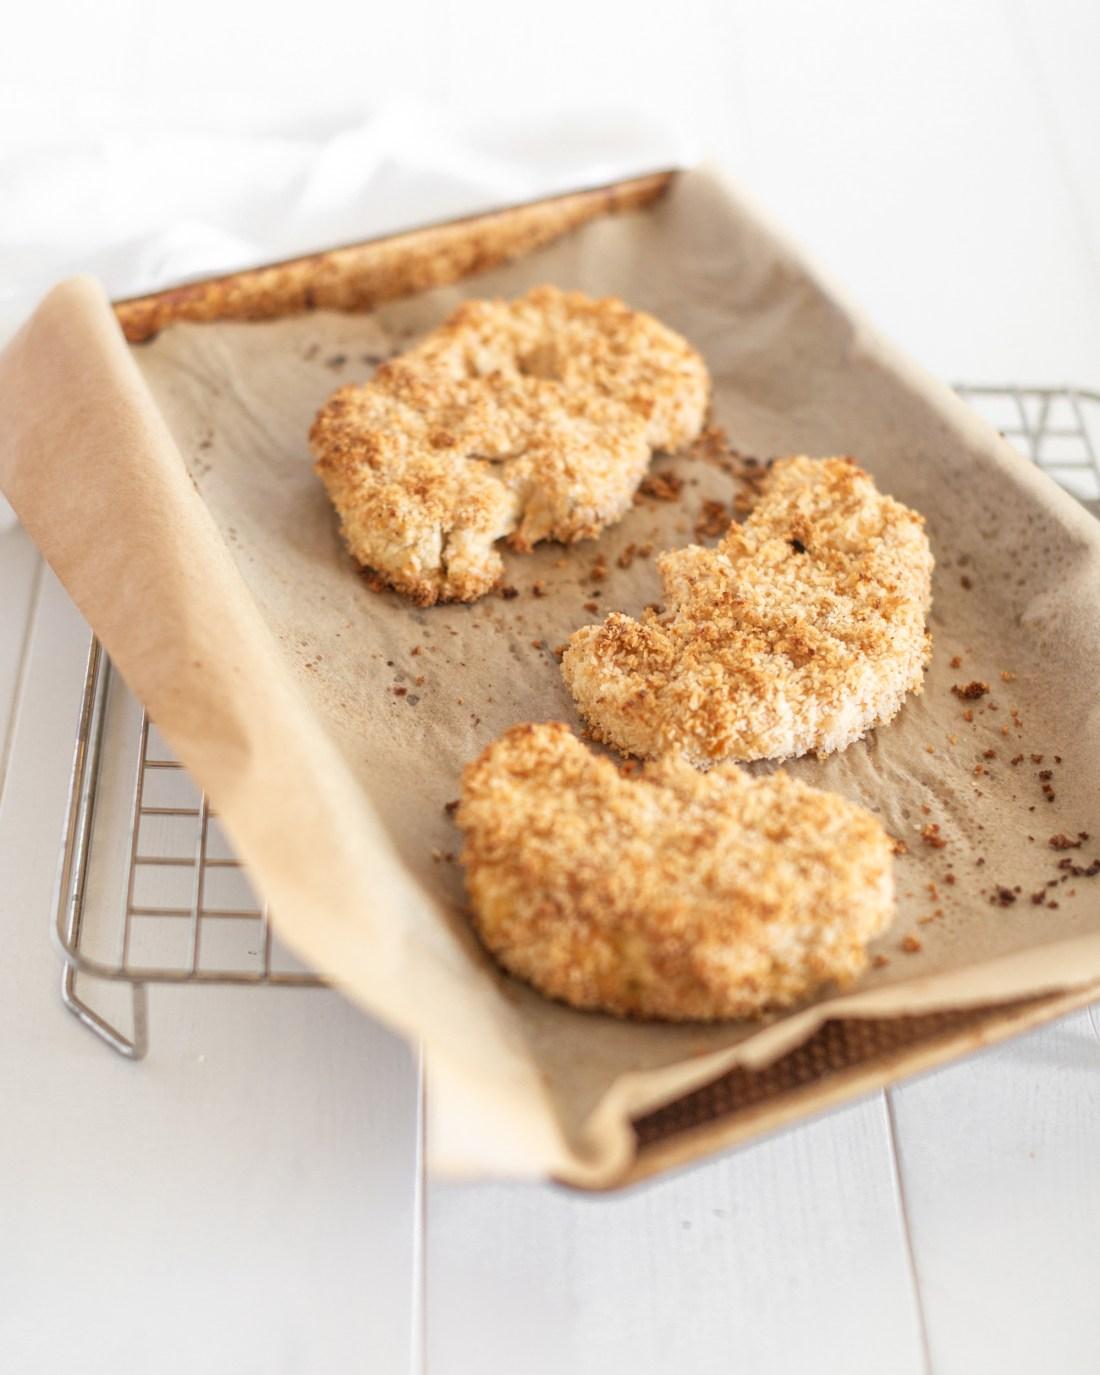 Baked Crispy Cauliflower Sandwiches recipe - vegan option